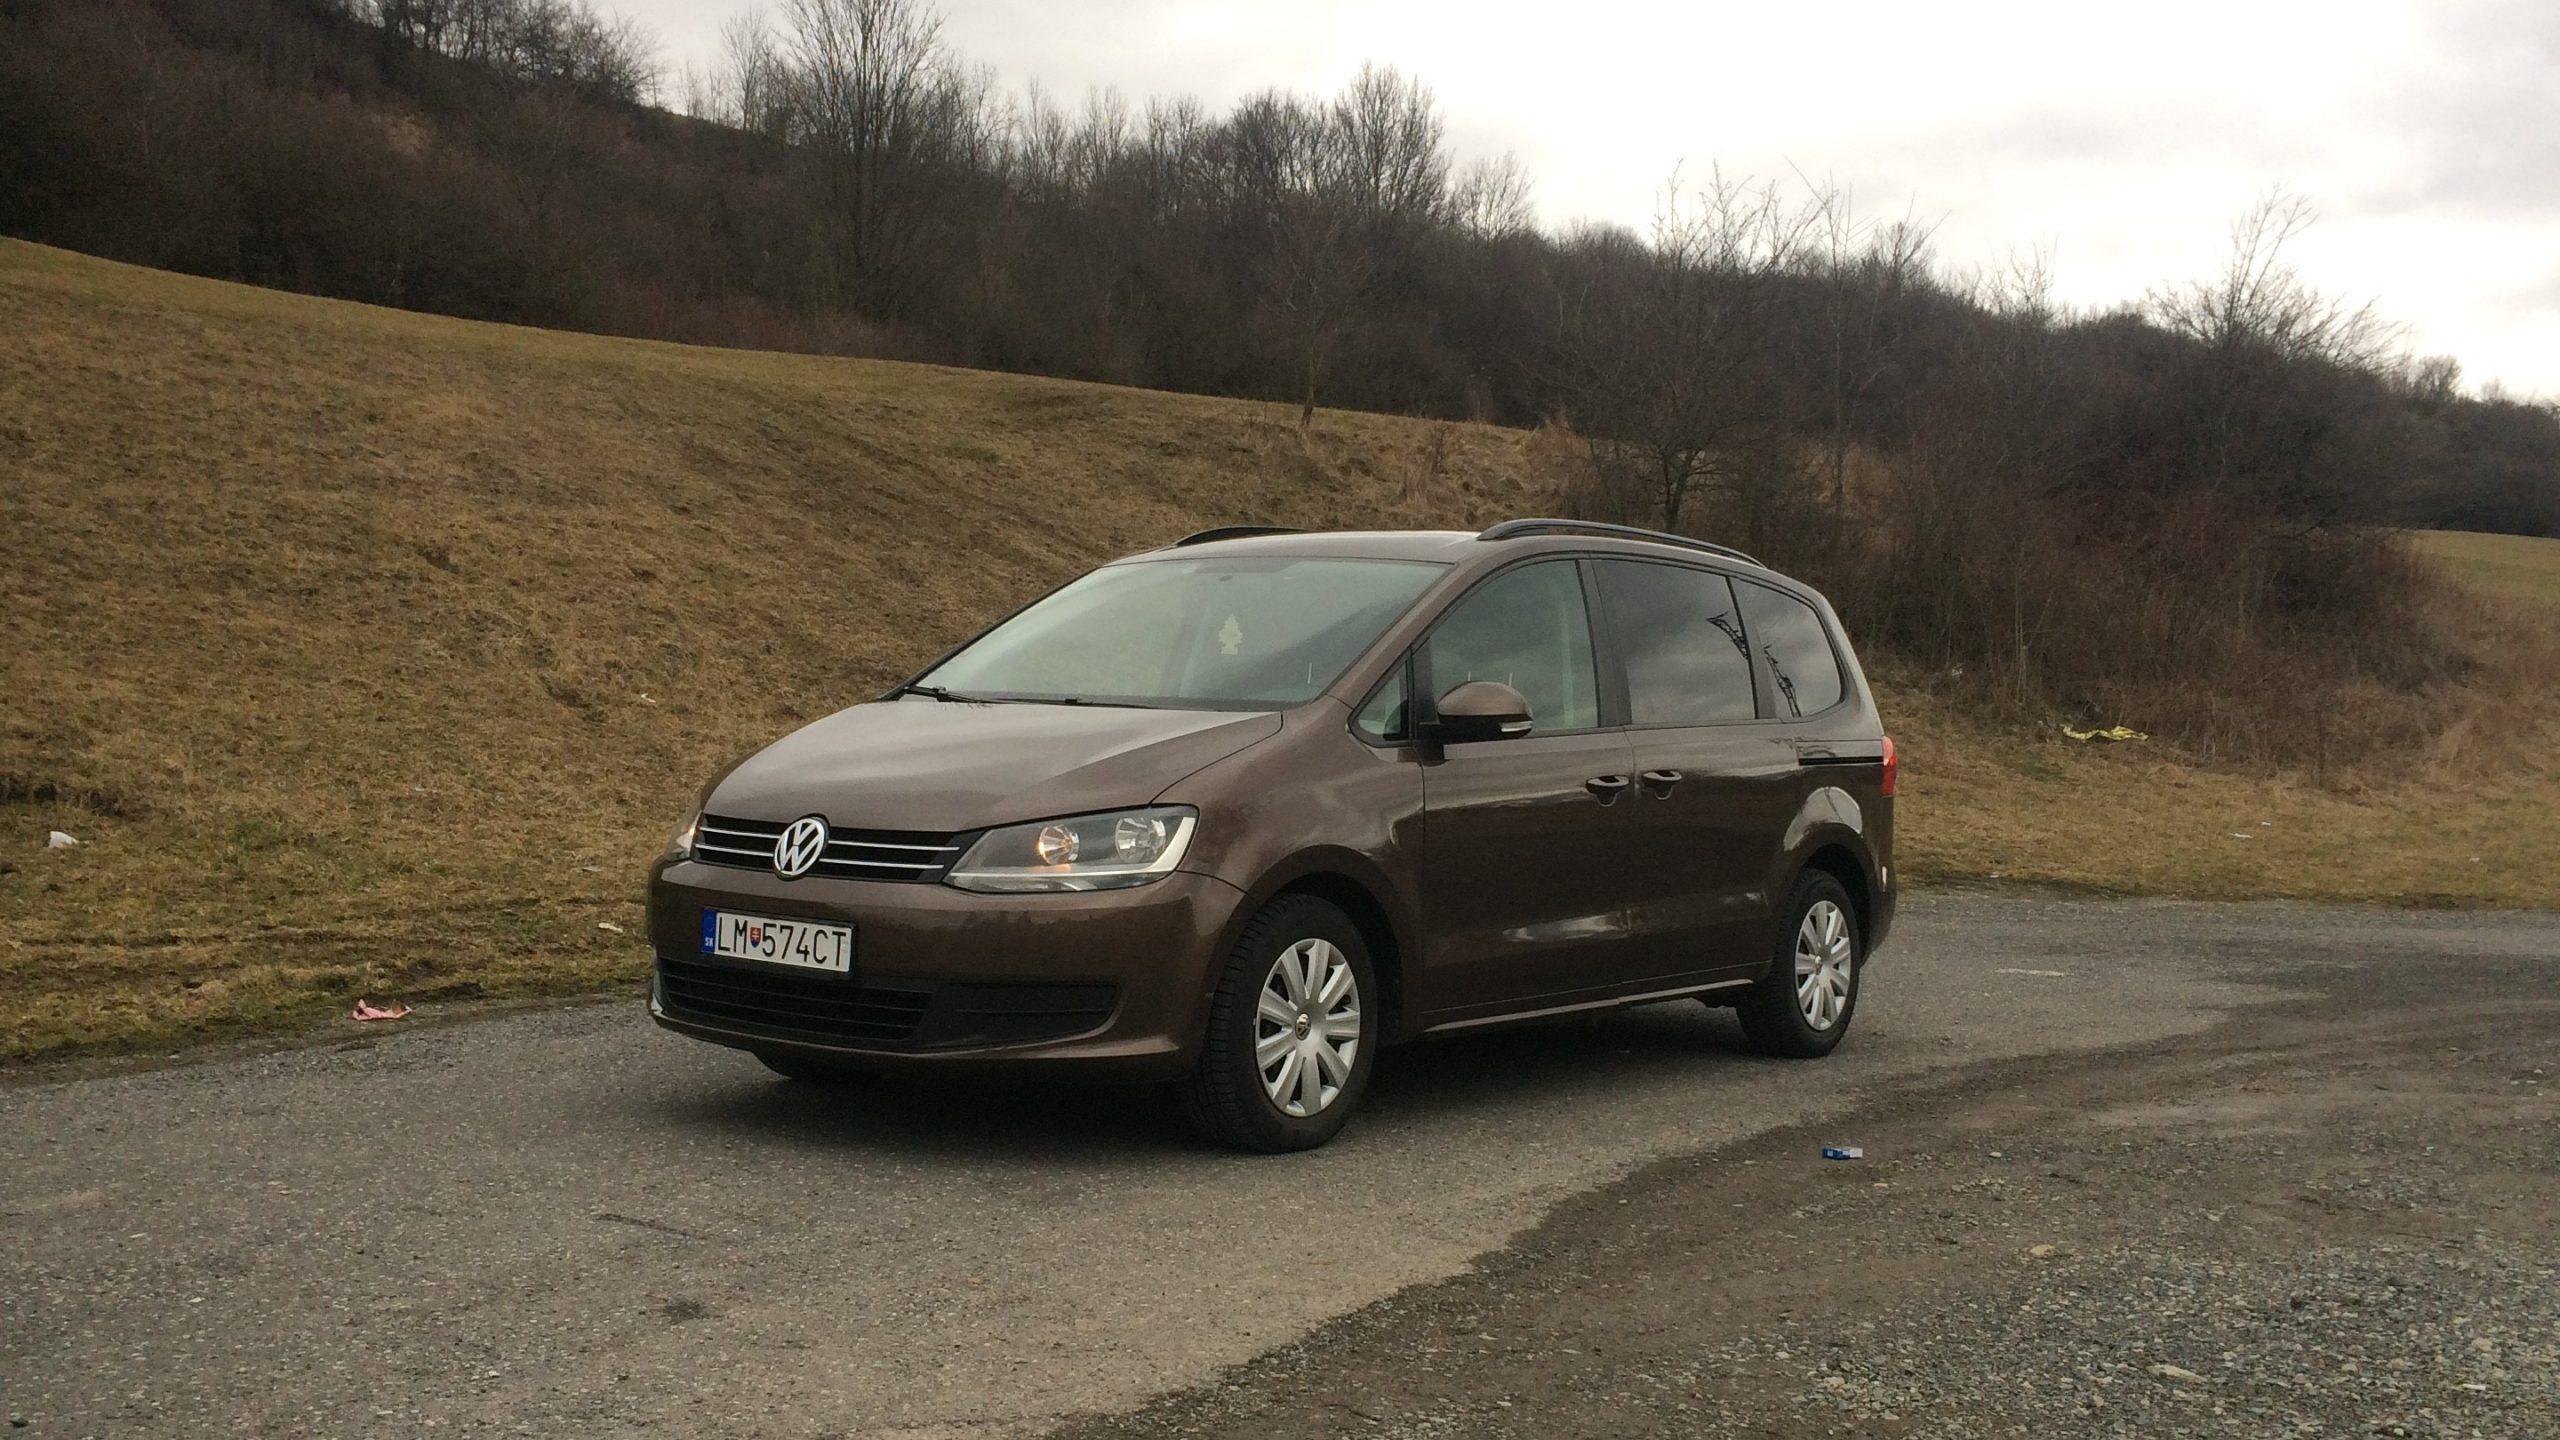 volkswagen sharan 2.0 tdi 2011 test recenzia